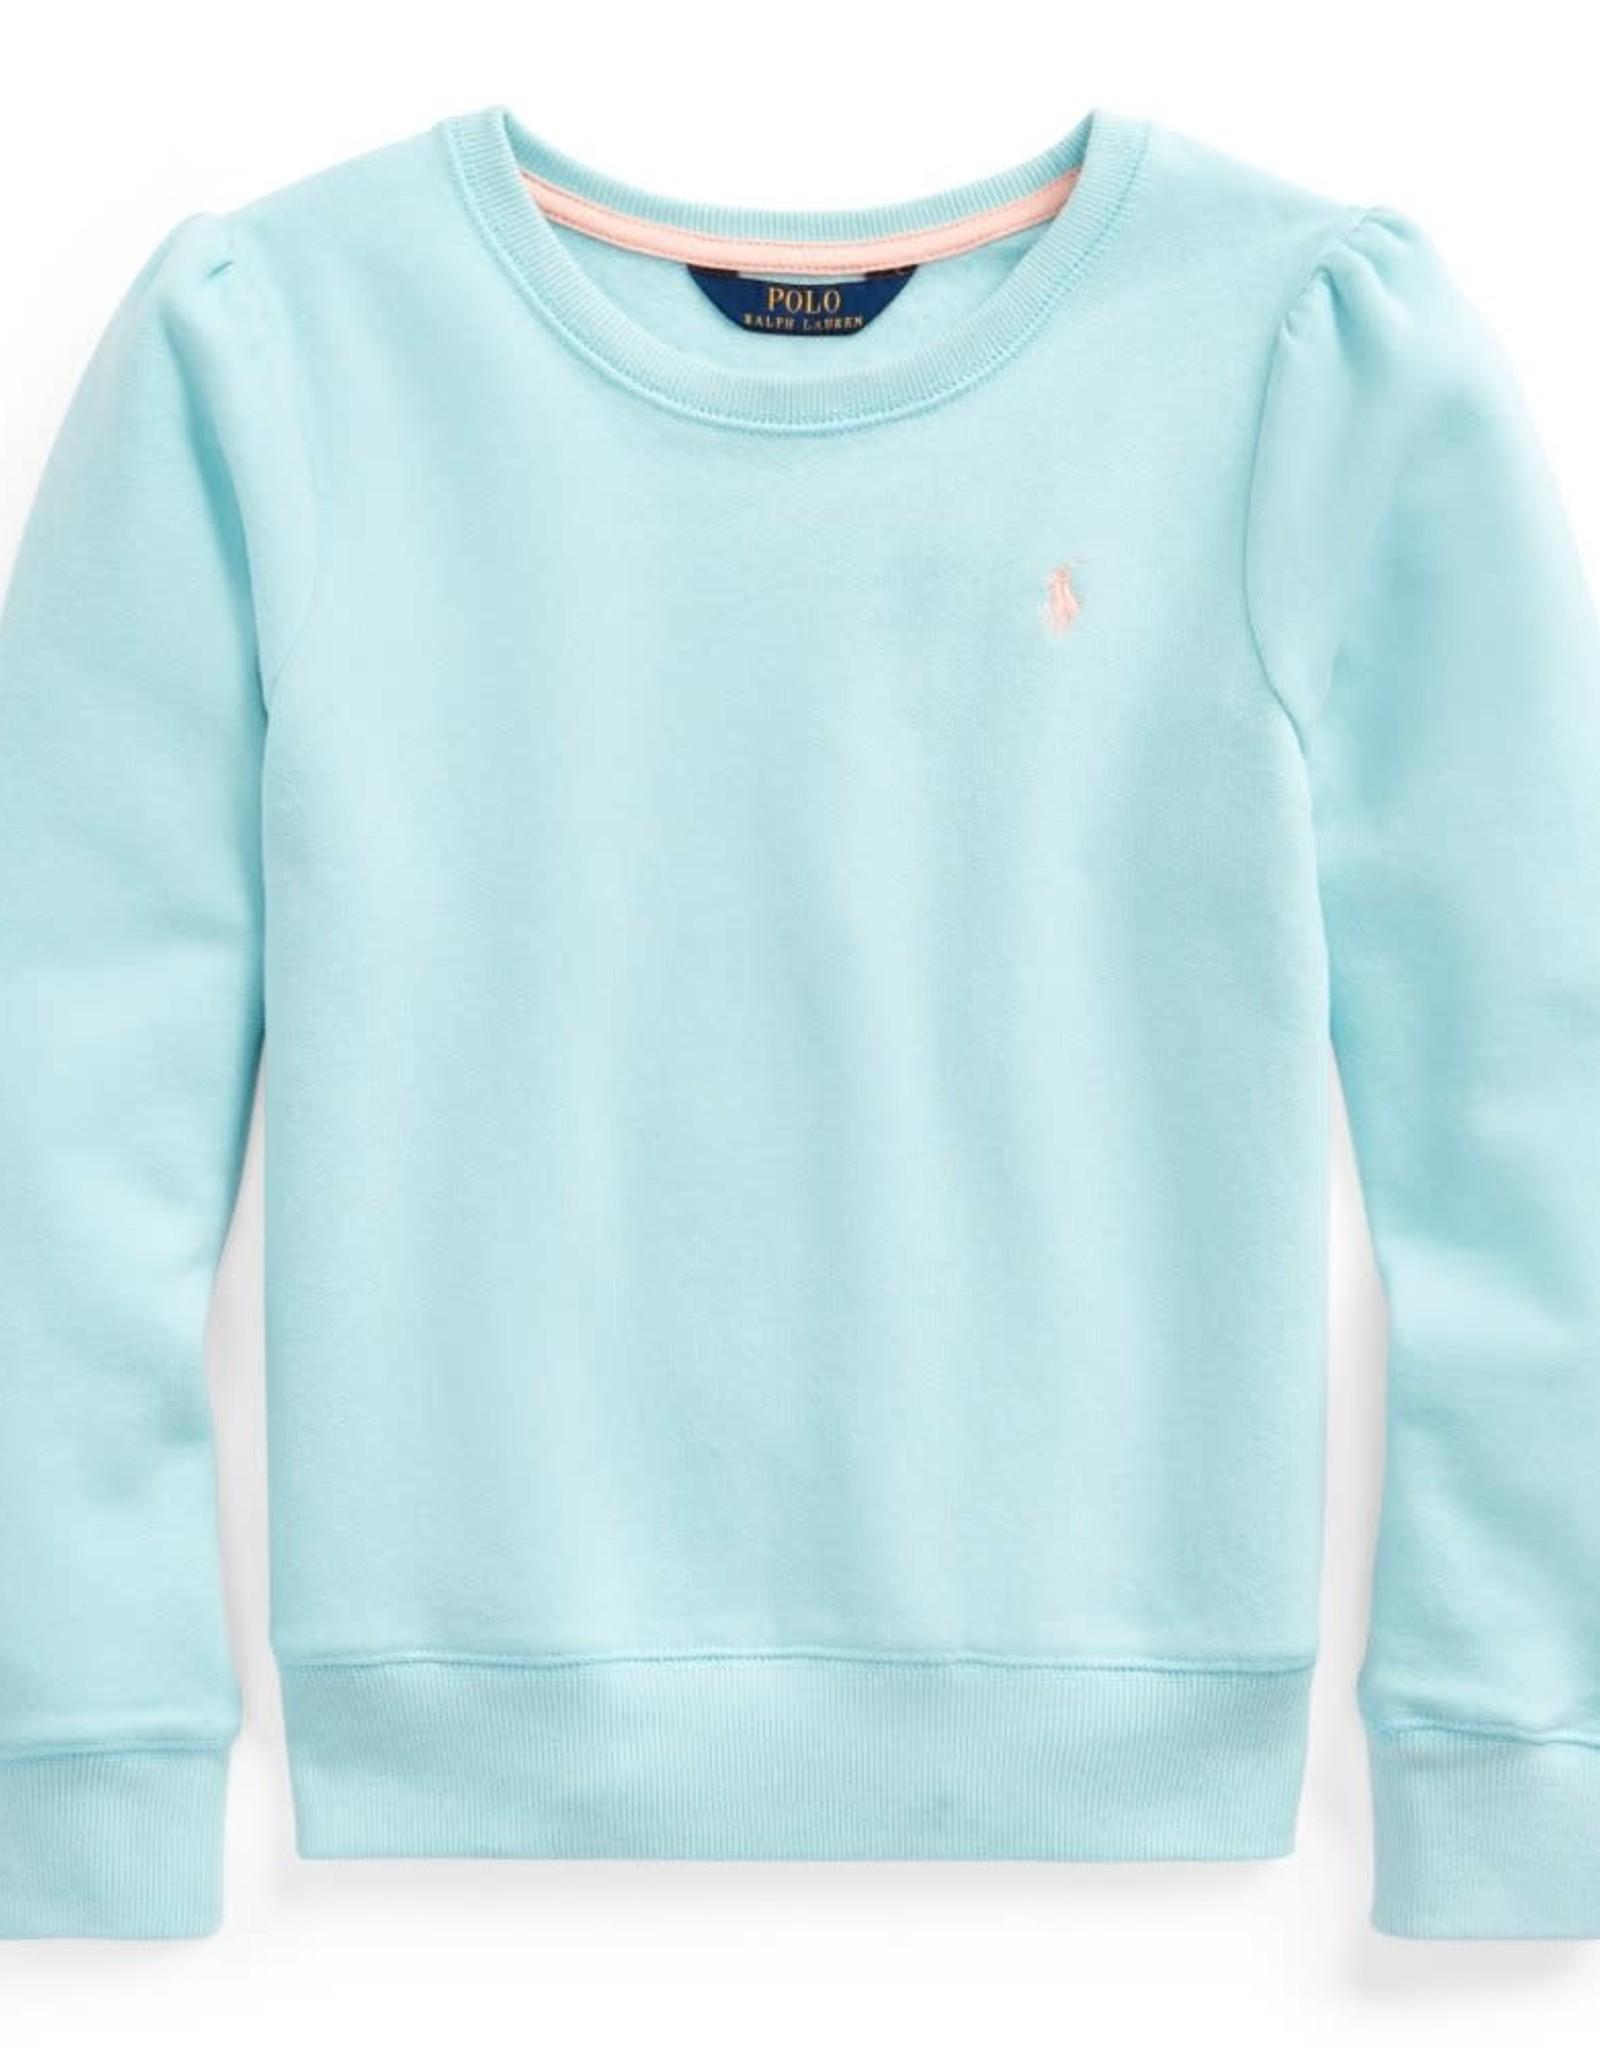 RALPH LAUREN RALPH LAUREN Sweater blauw girls